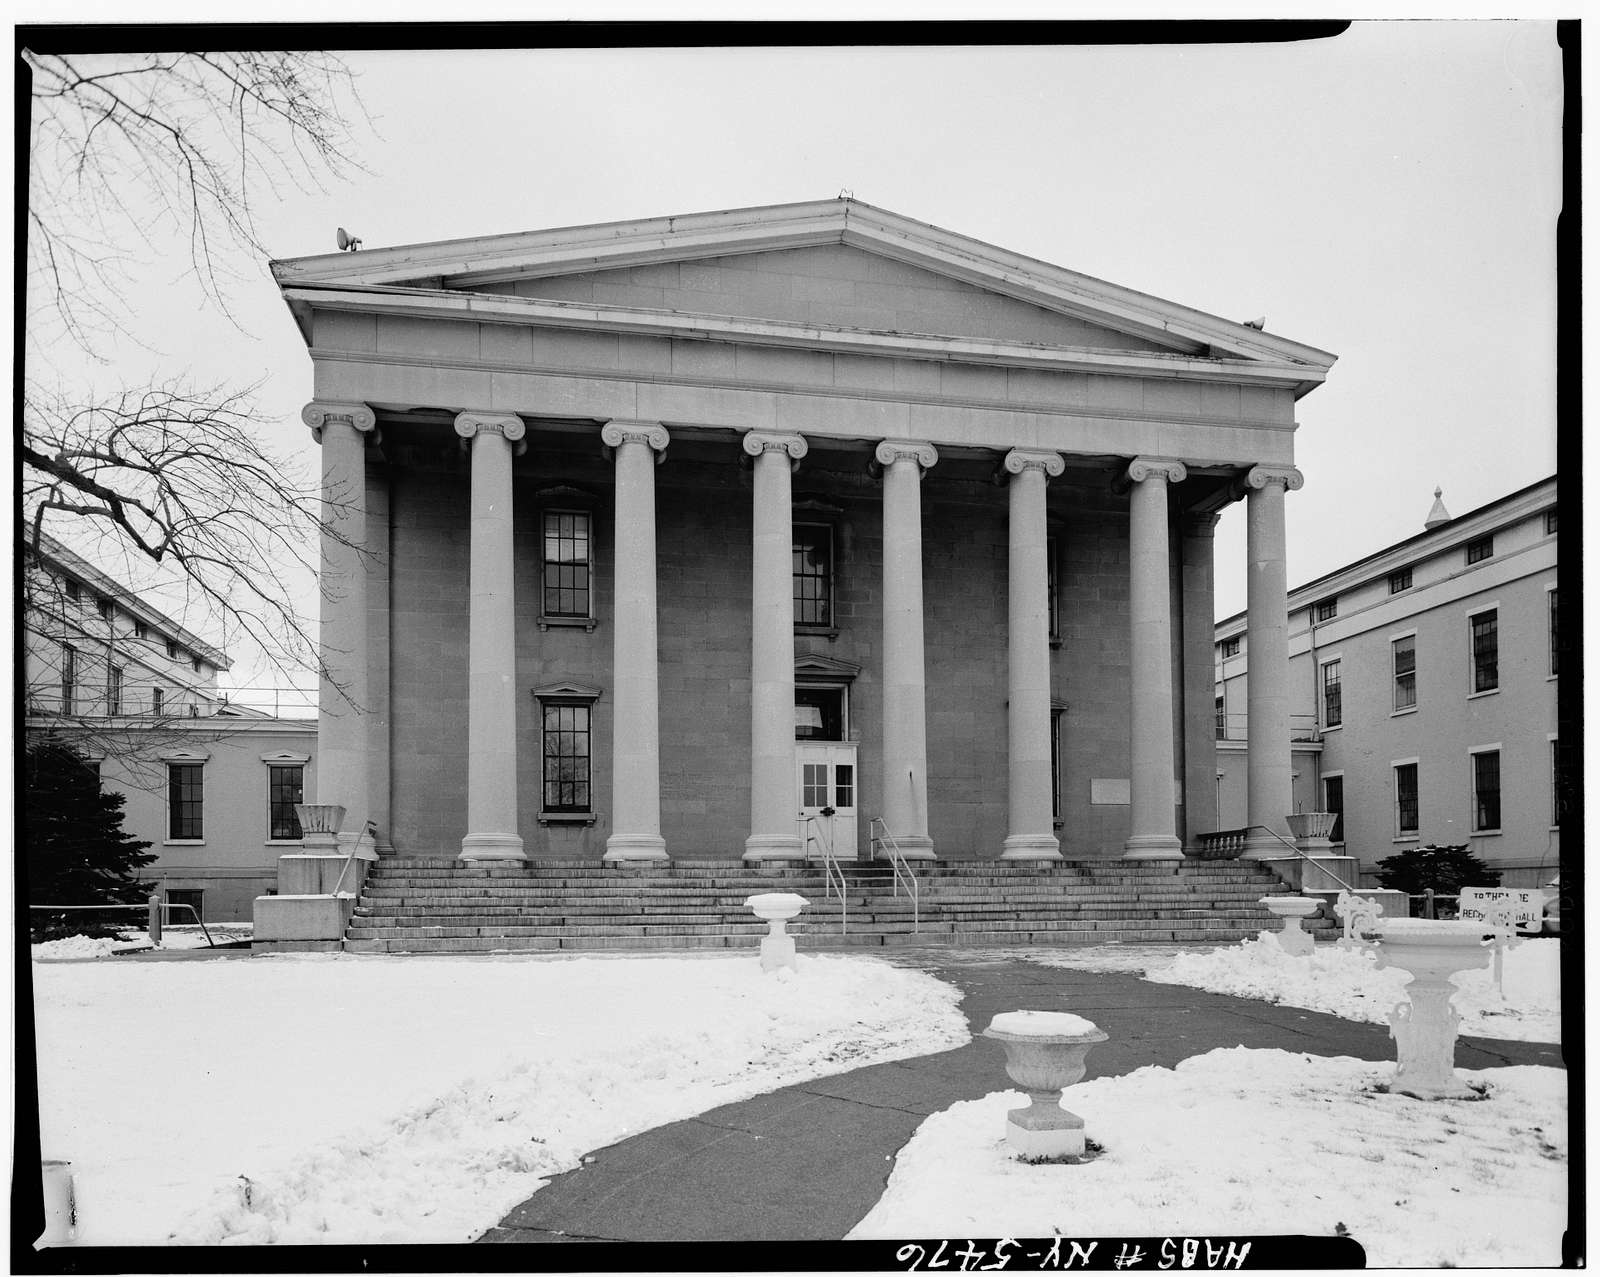 Sailors' Snug Harbor, Dormitory C & Administration Building, Richmond Terrace, New Brighton, Richmond County, NY